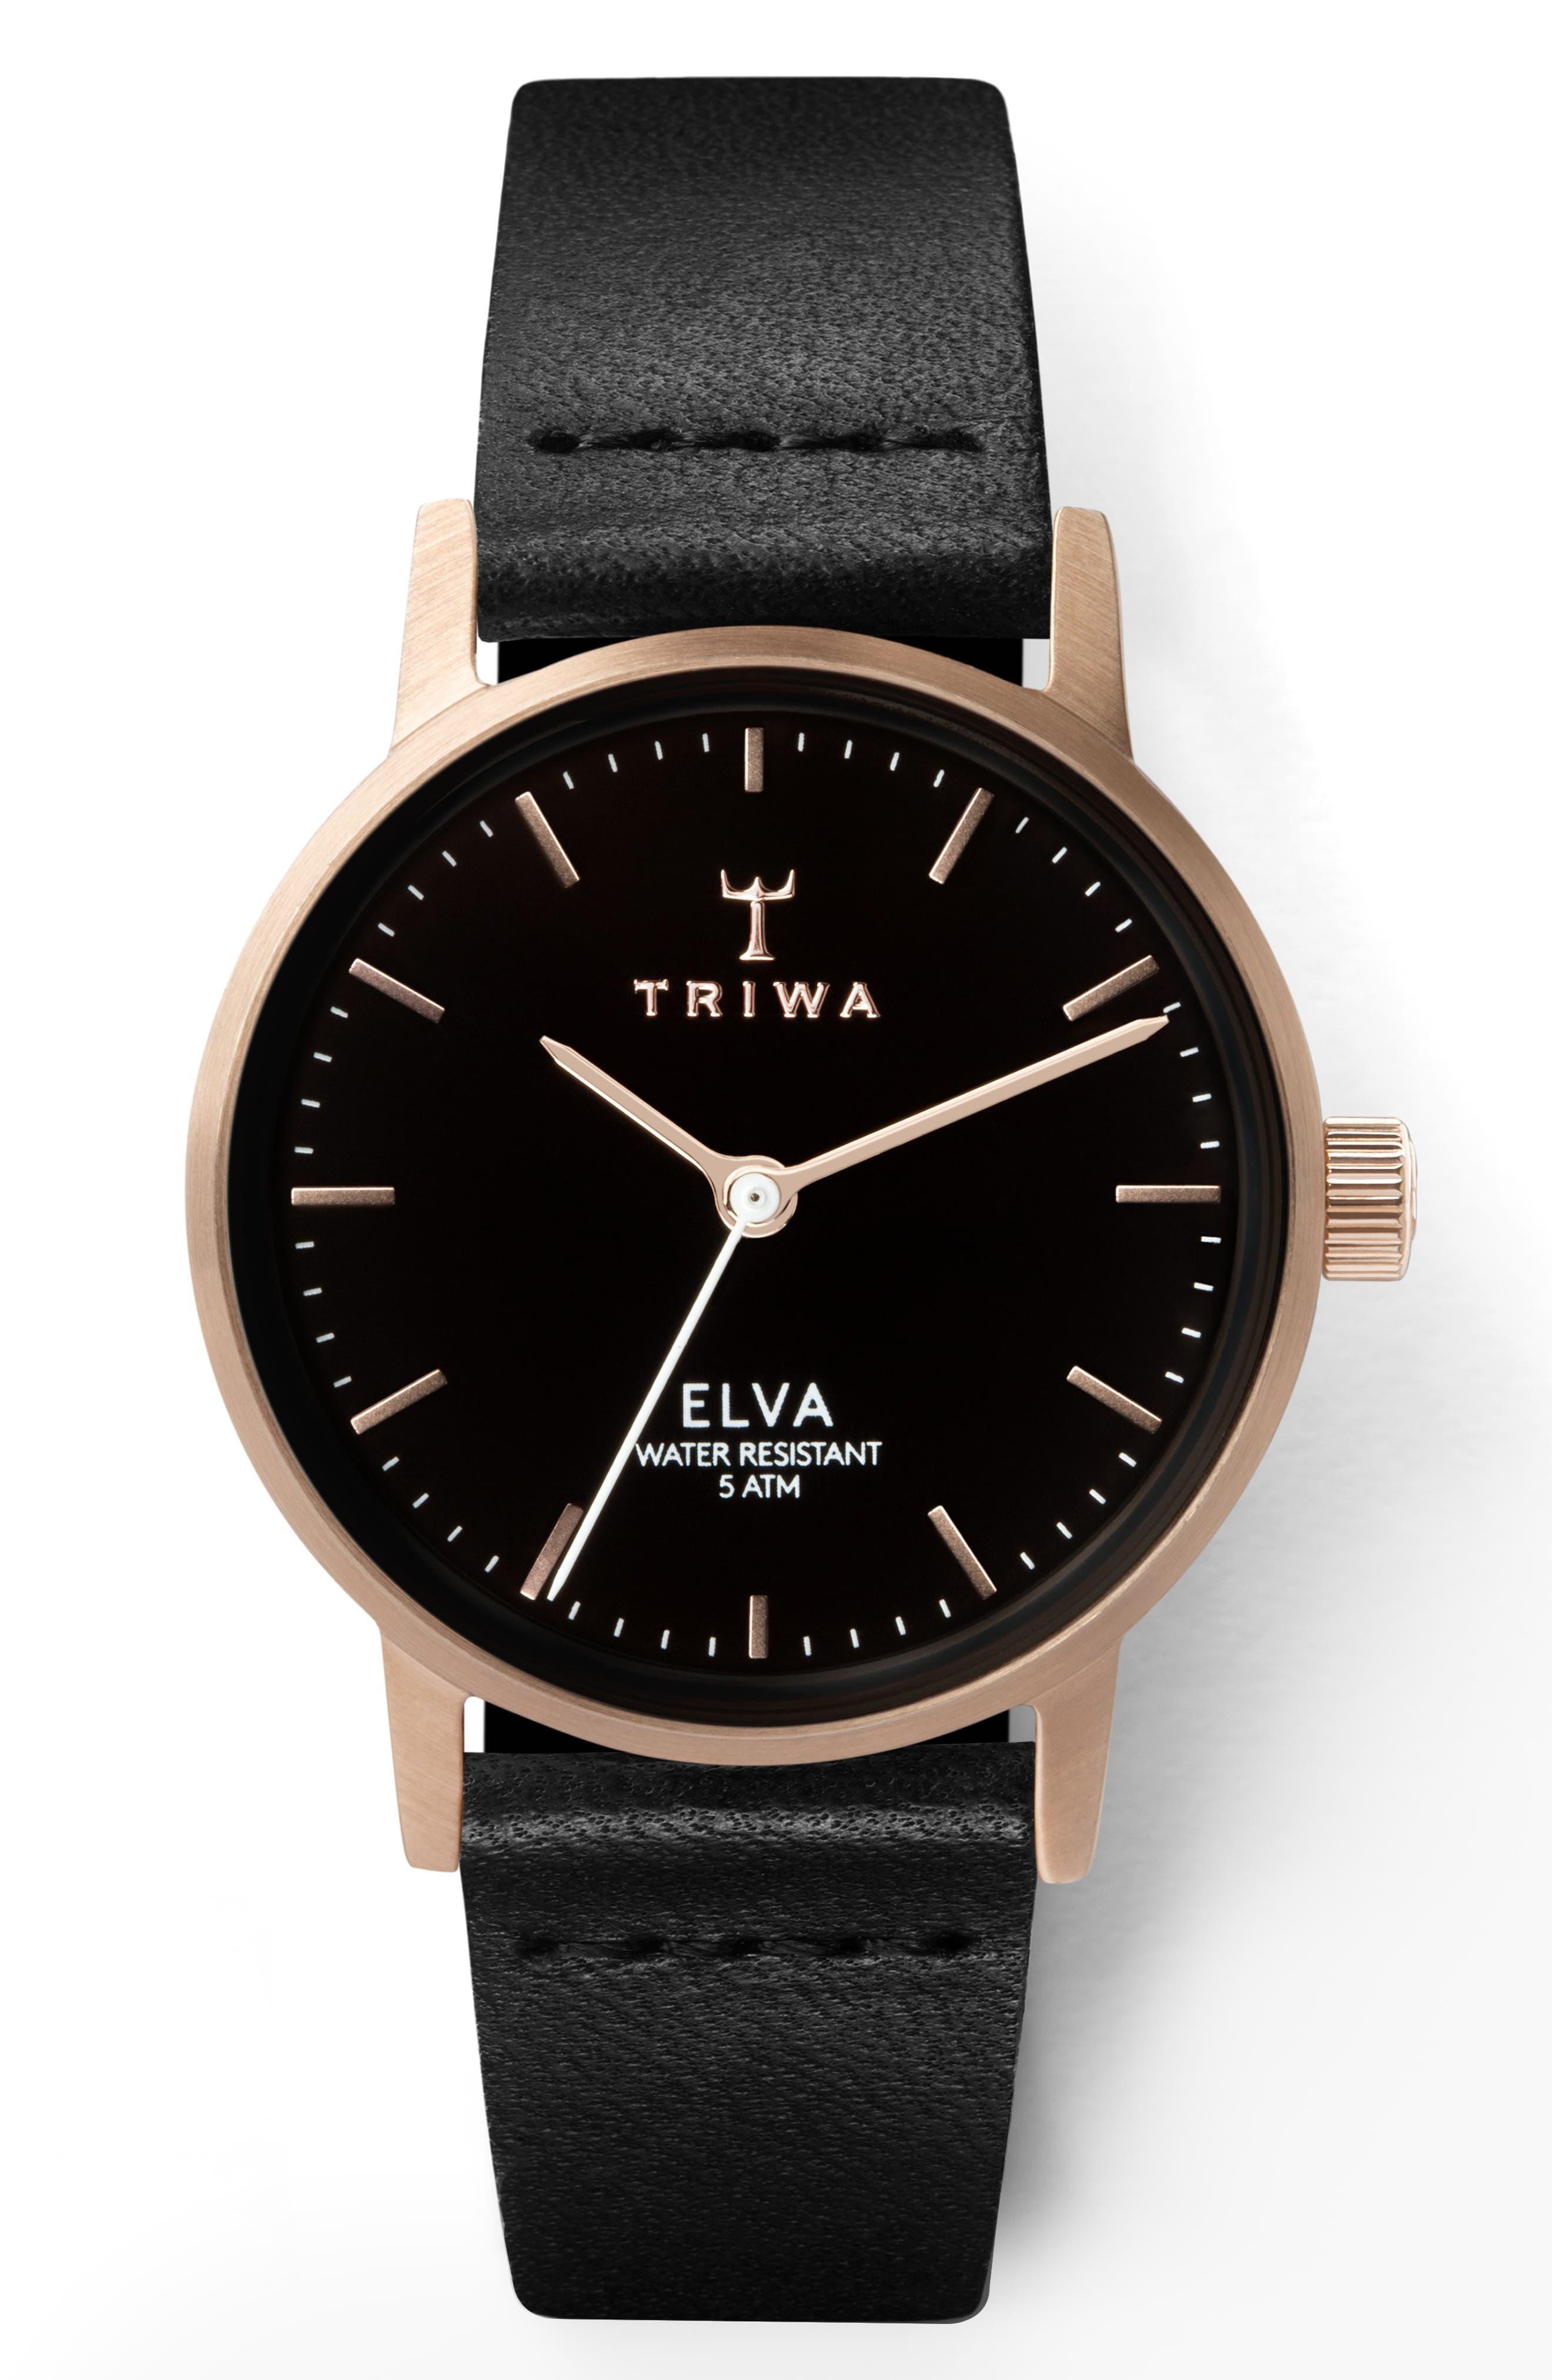 TRIWA ELVA LEATHER STRAP WATCH, 28MM